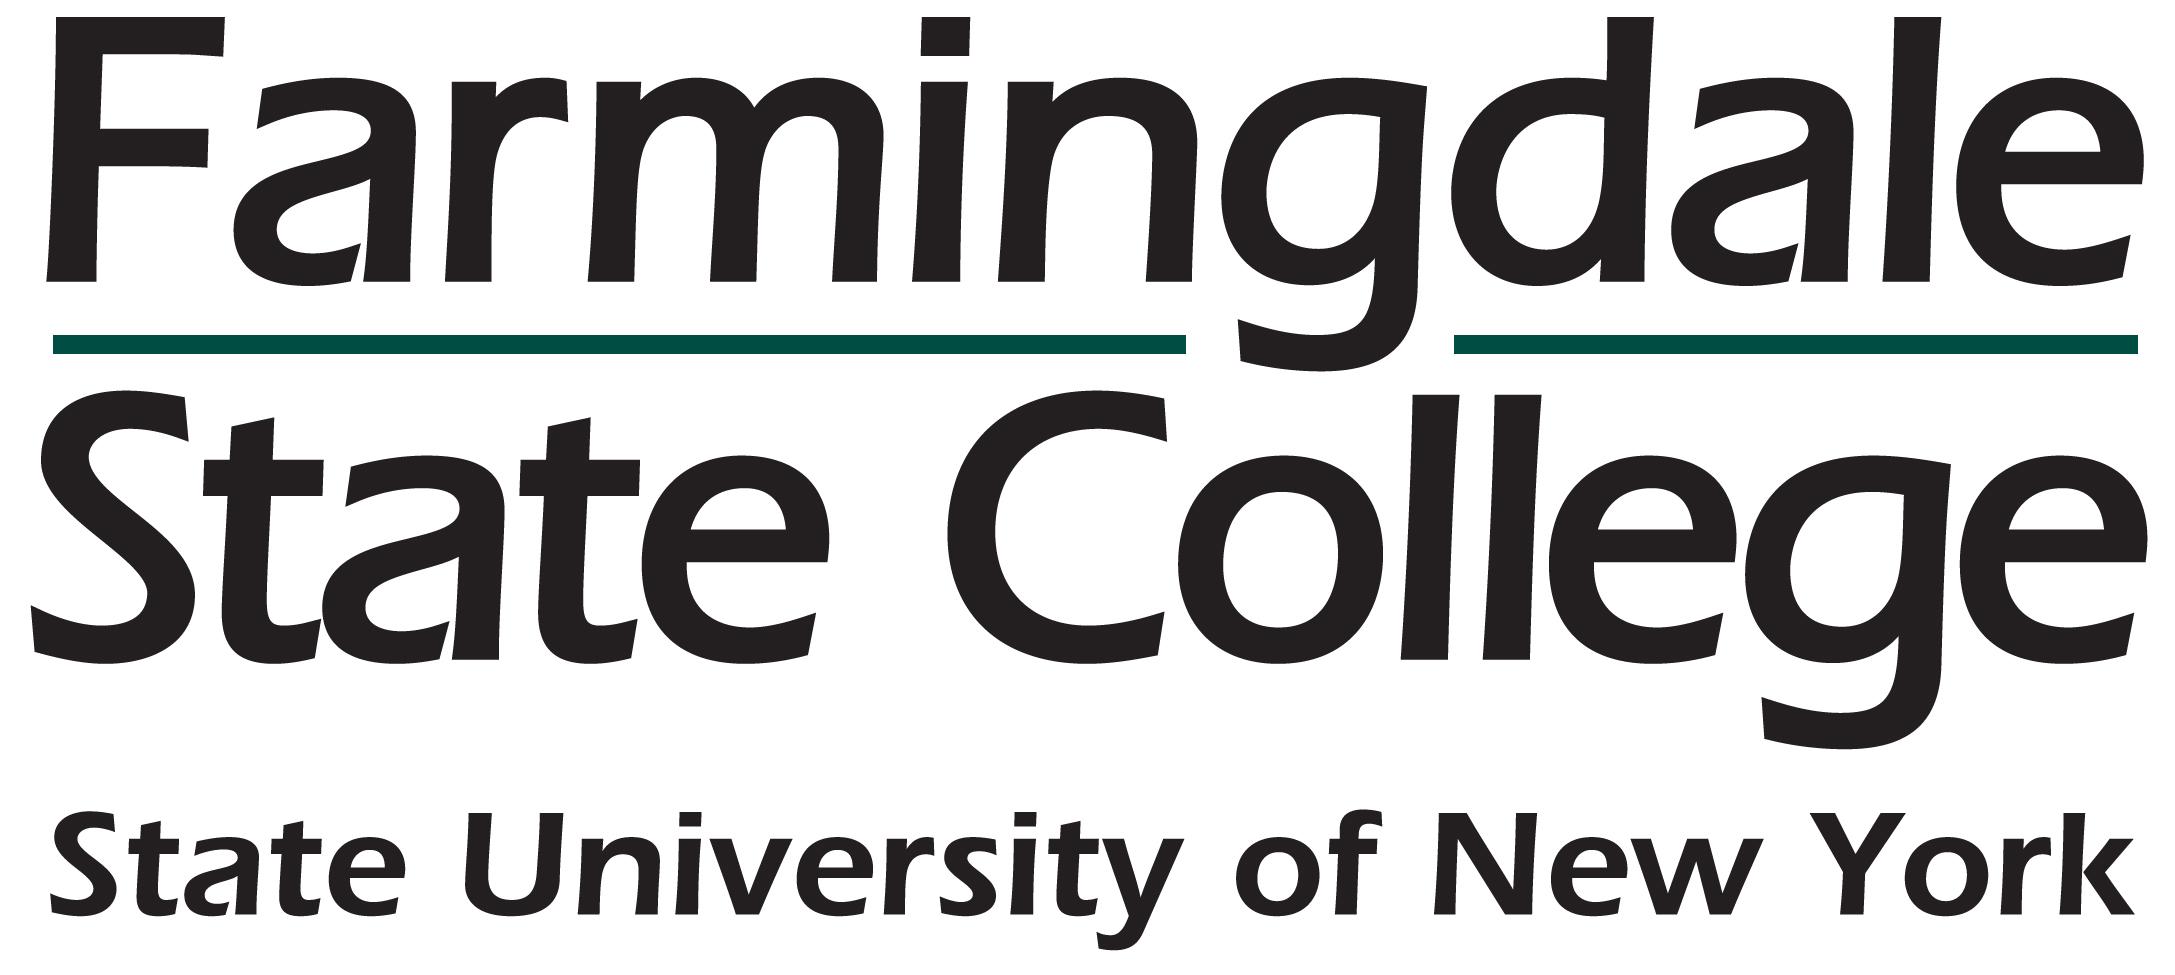 Farmingdale State College Wikiwand